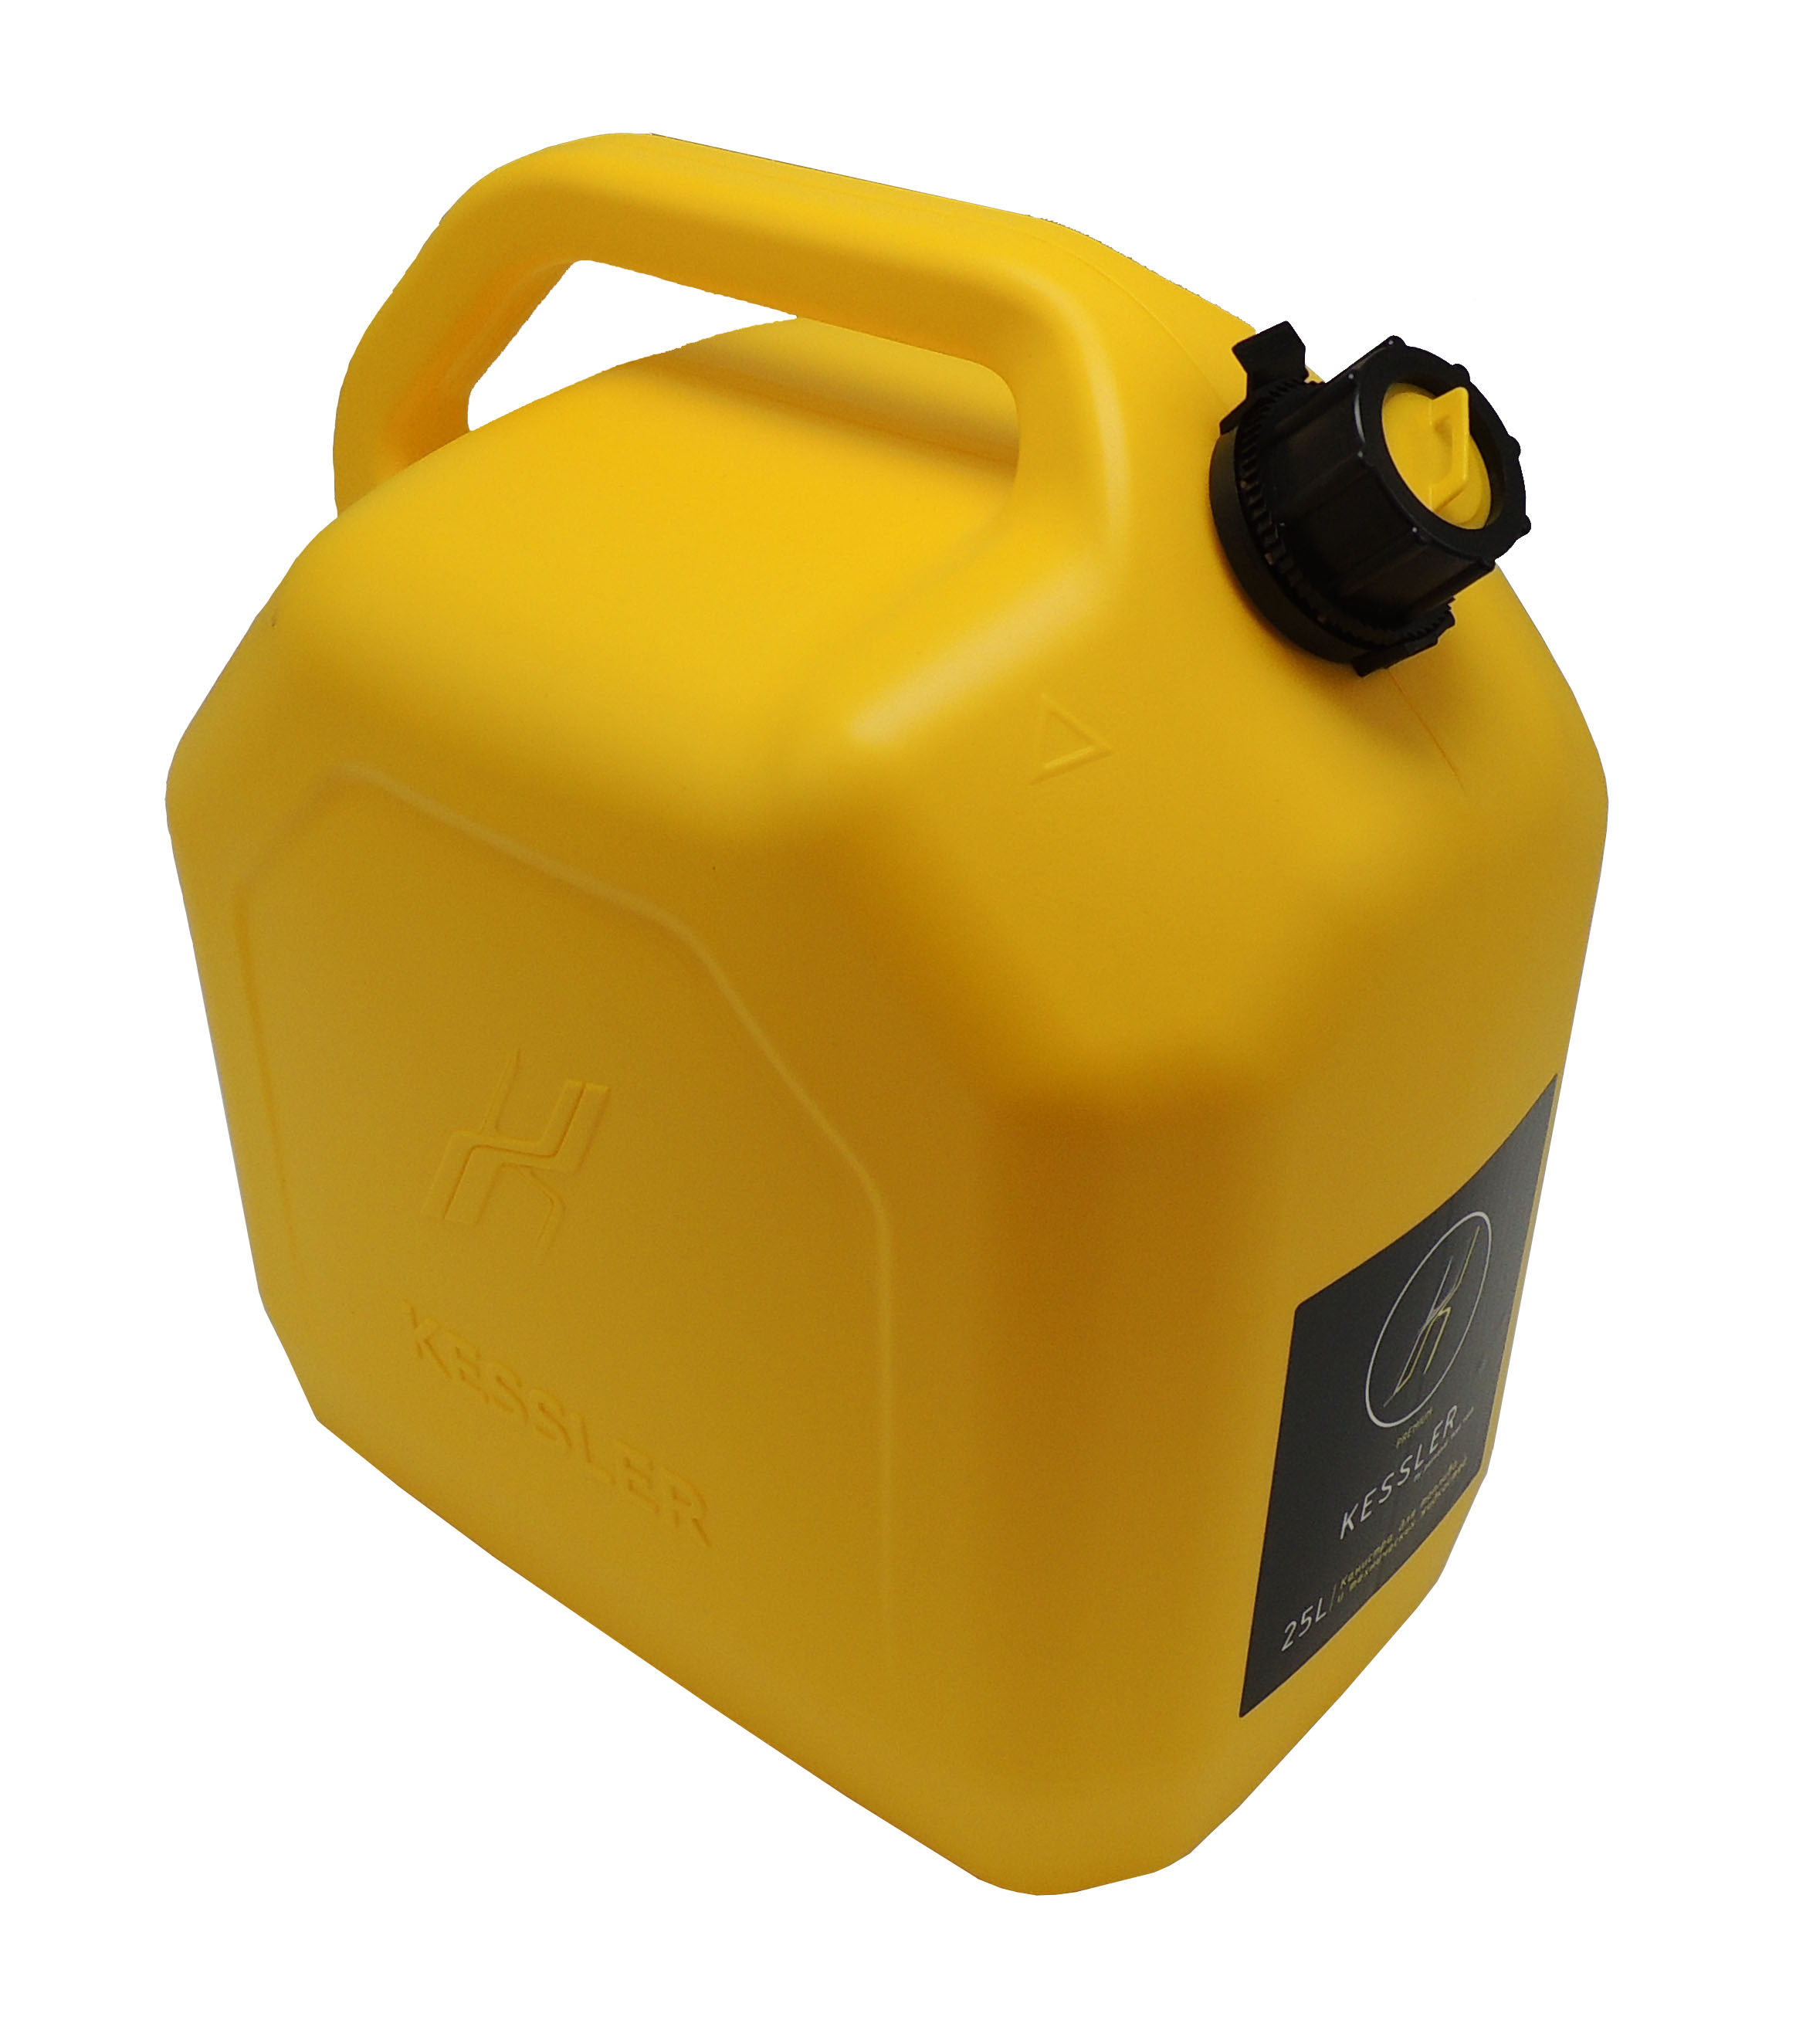 Канистра для бензина KESSLER А1-02-04, желтый sarah kessler fuchy dzieła zlecenia